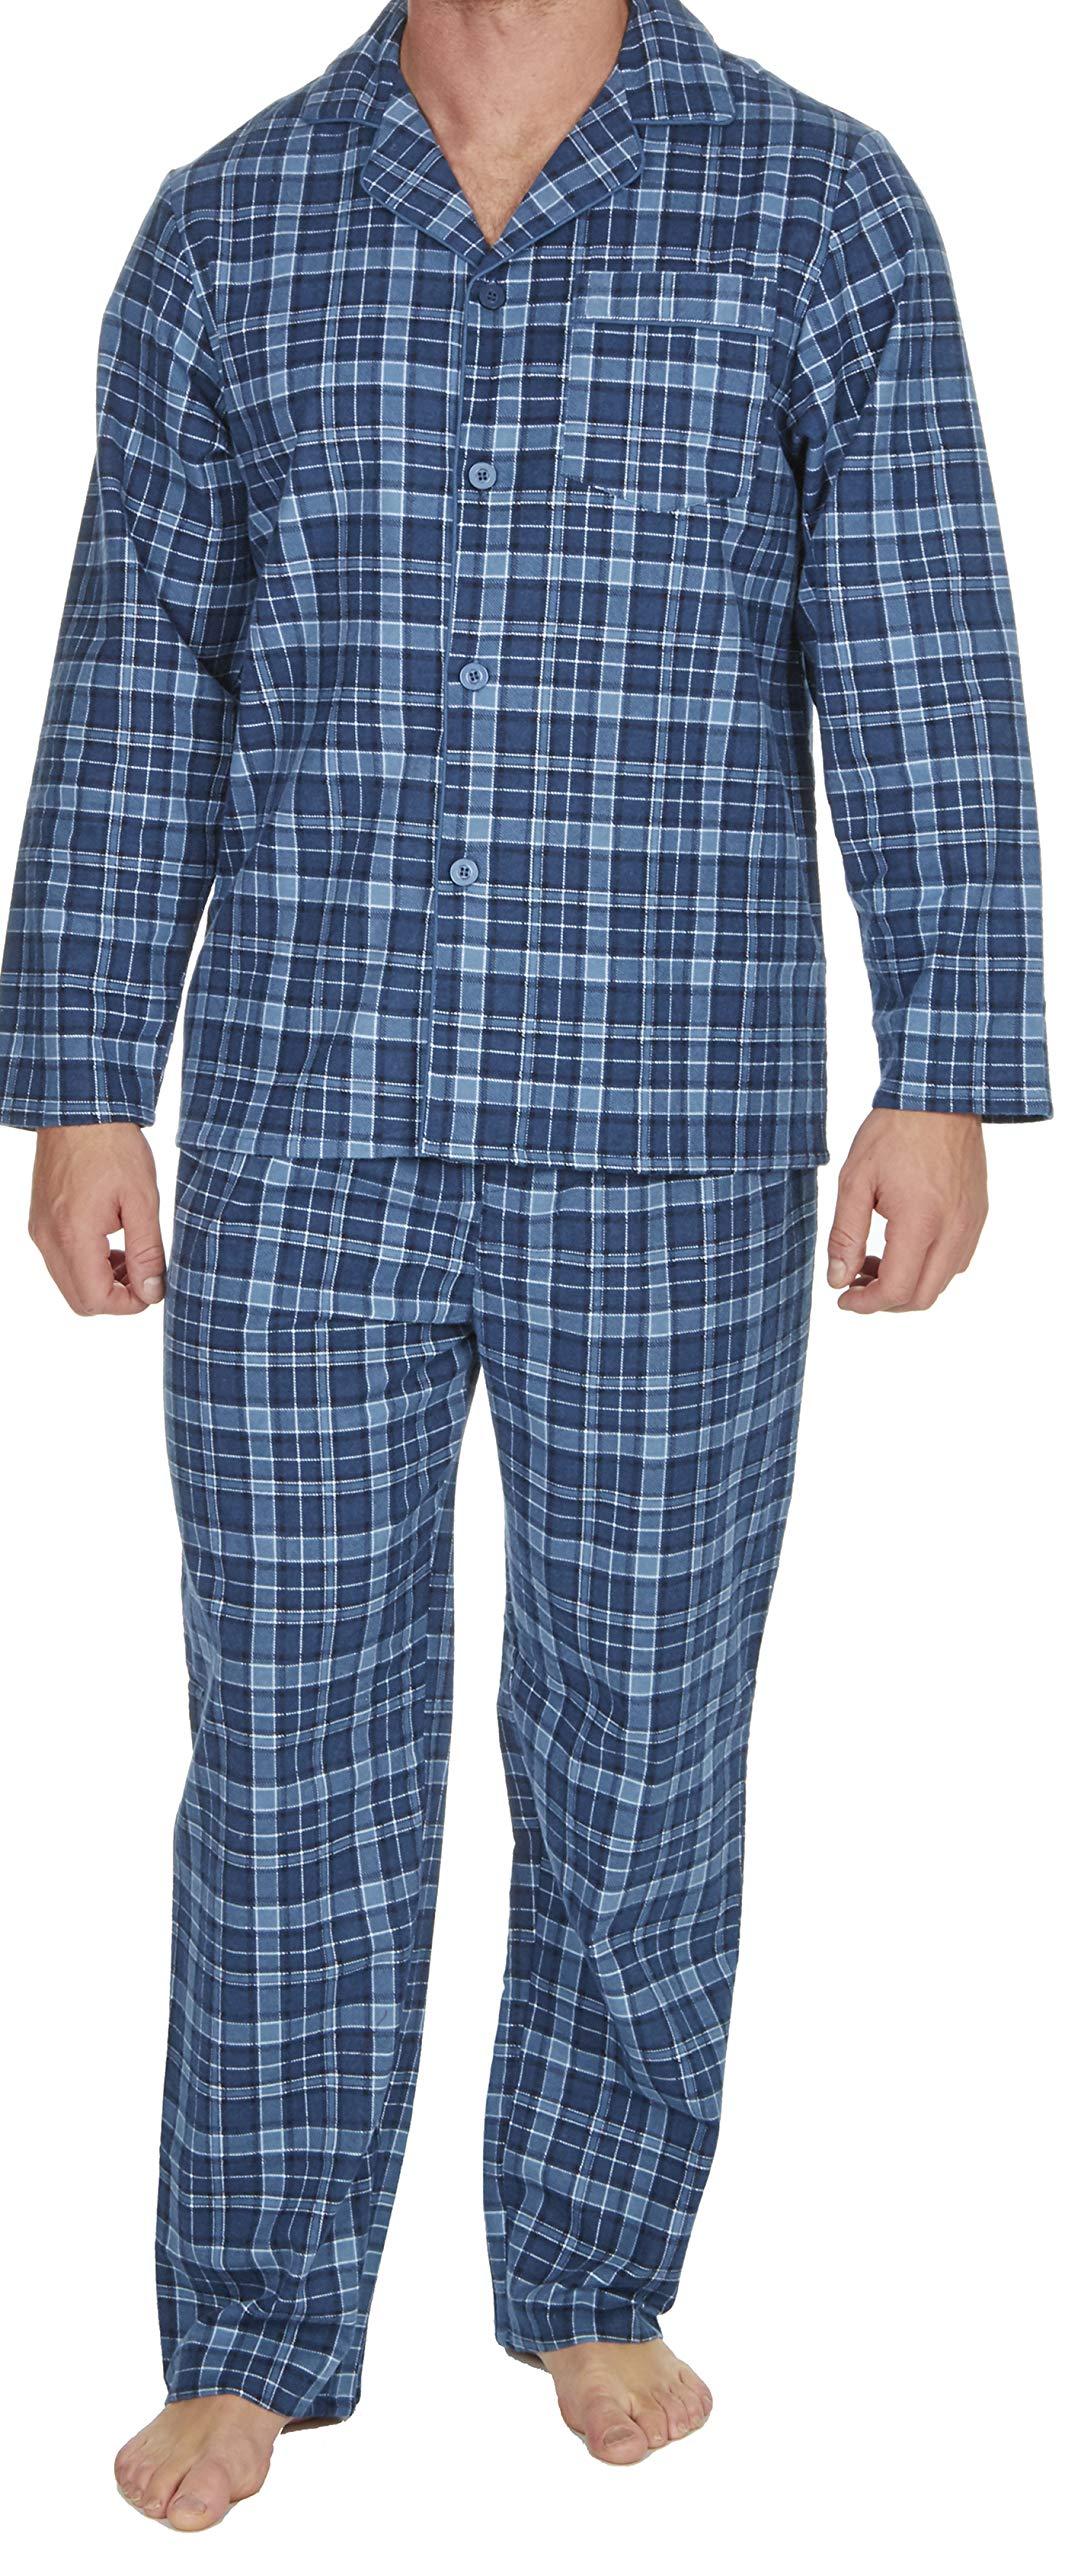 Champion Mens Kingston Wyncette Cotton Pyjama Lounge Wear